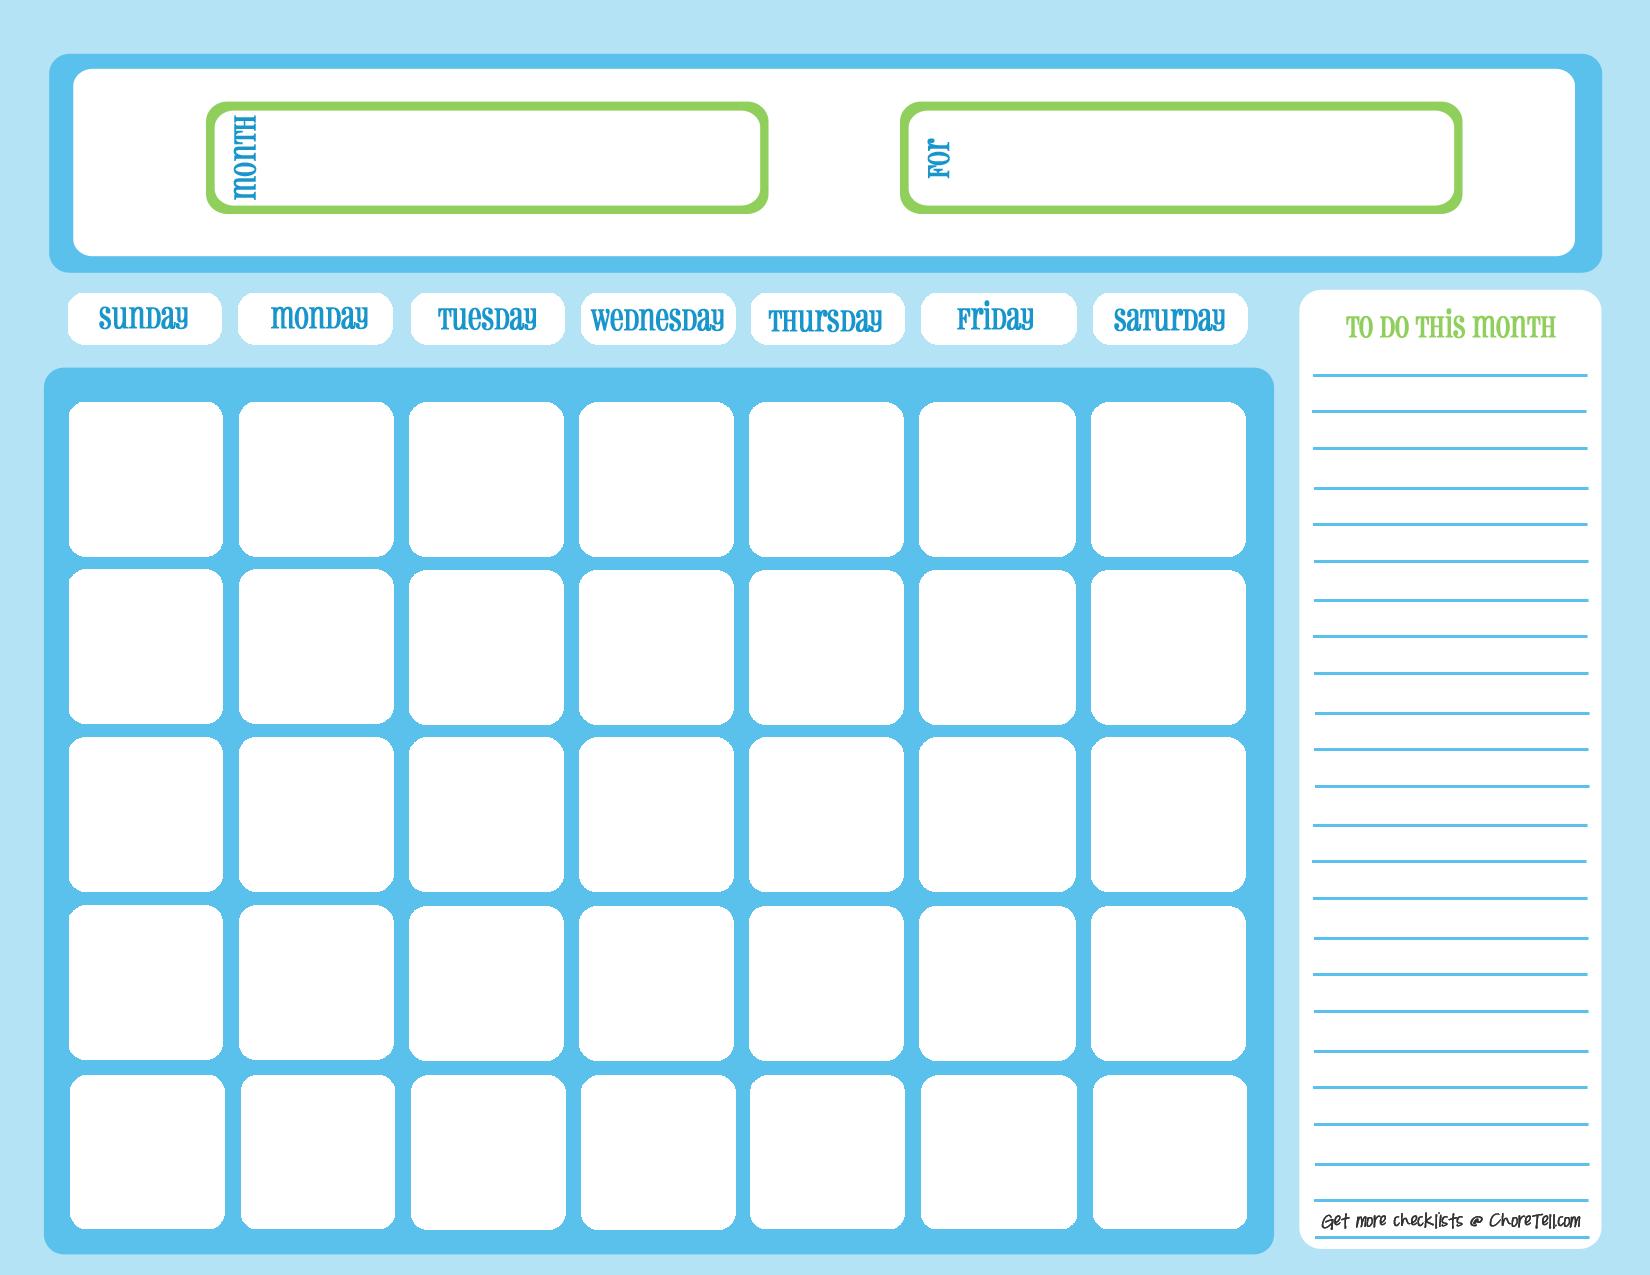 Blank Chore Calendar Printable #56 | Church & Scouts | Pinterest ...